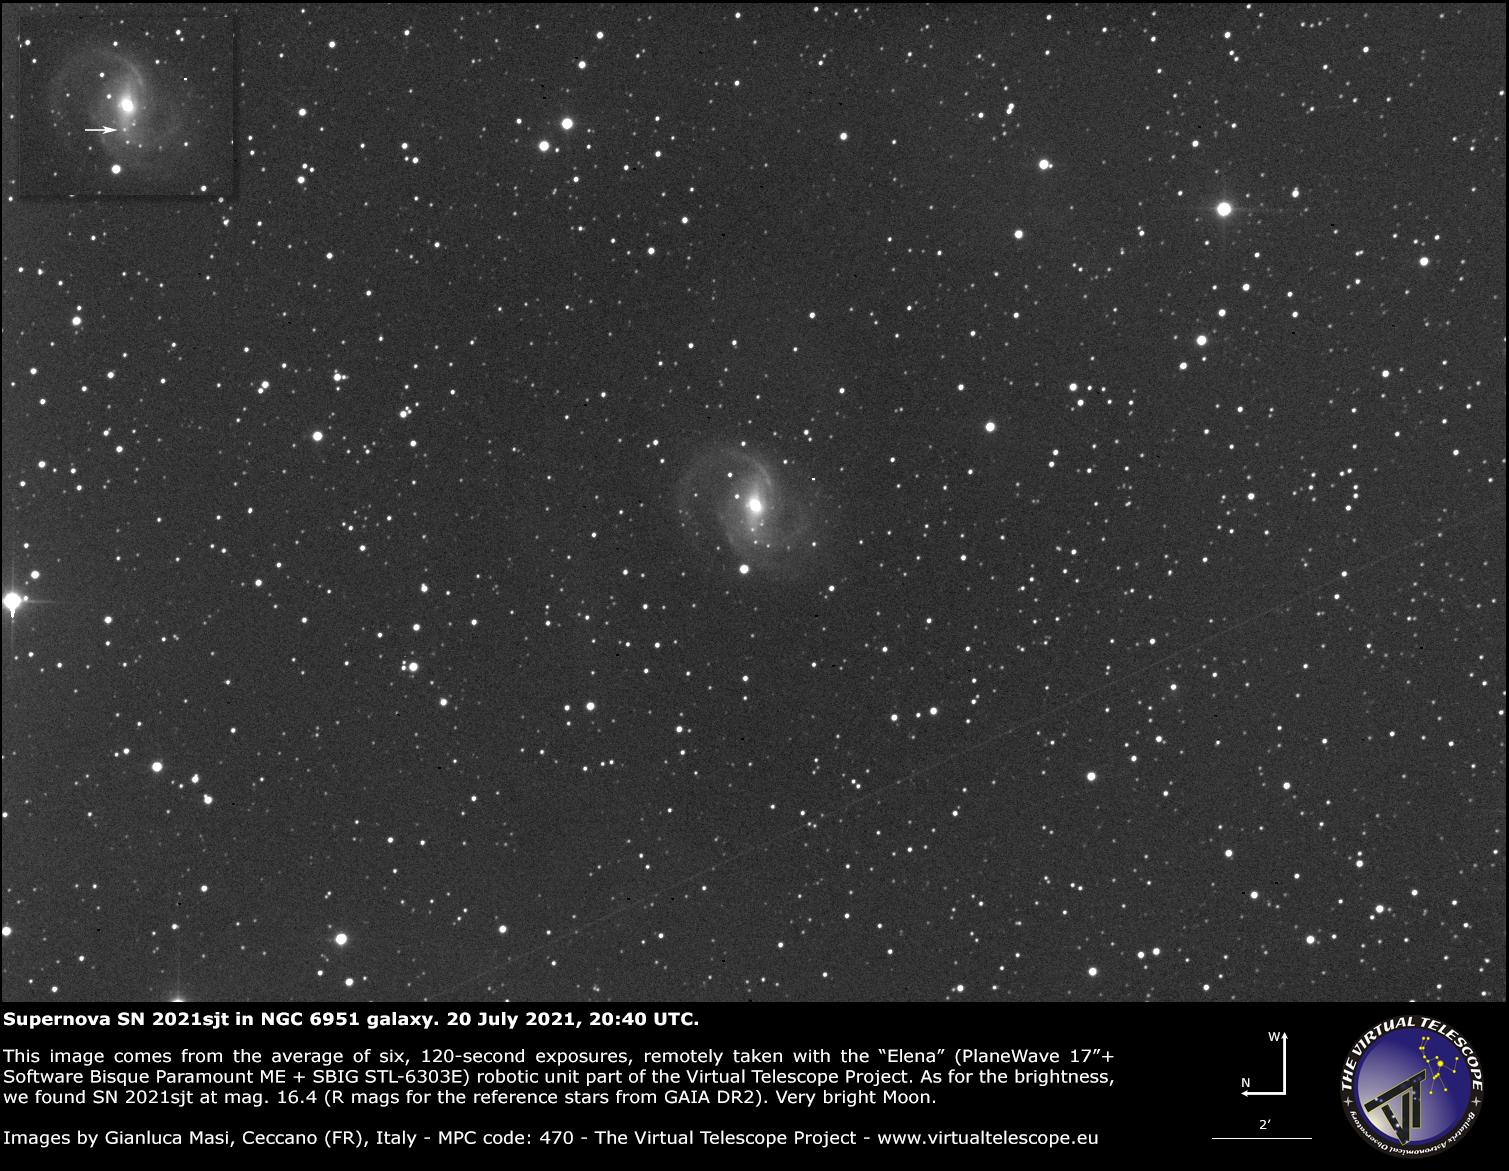 Supernova SN 2021sjt in NGC 6951 galaxy. 20 July 2021.